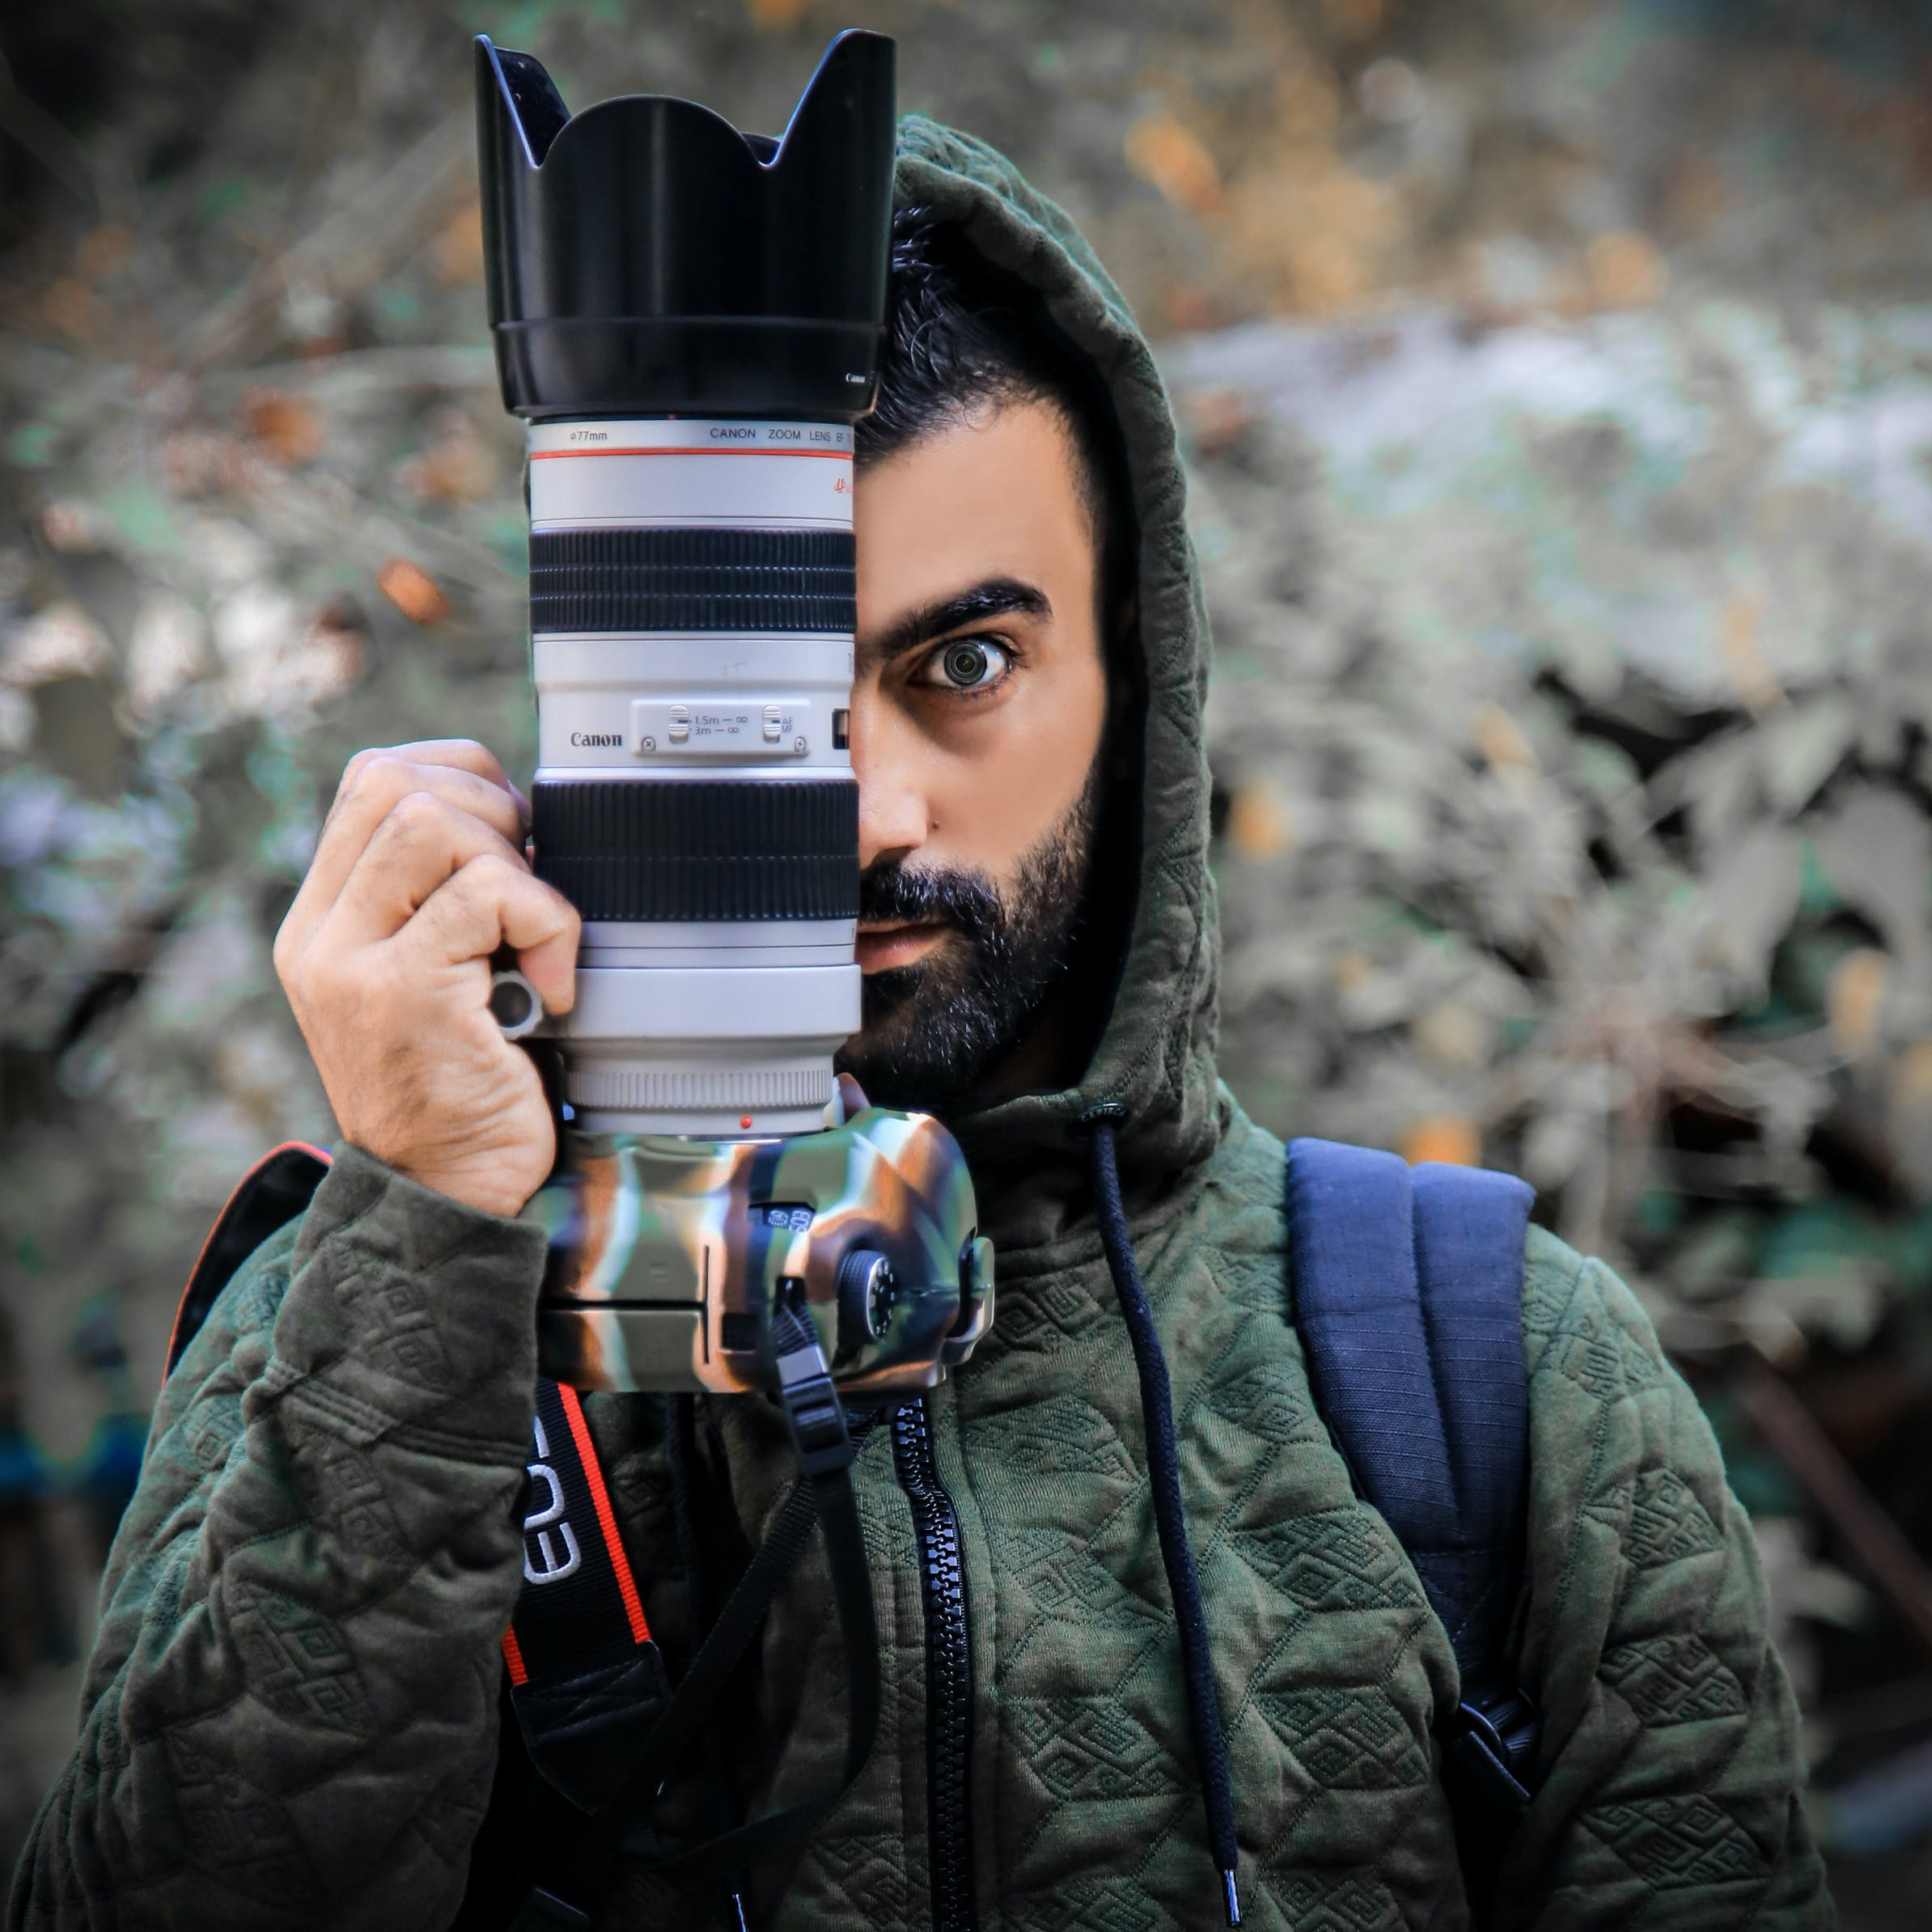 Person Holding a Dslr Camera